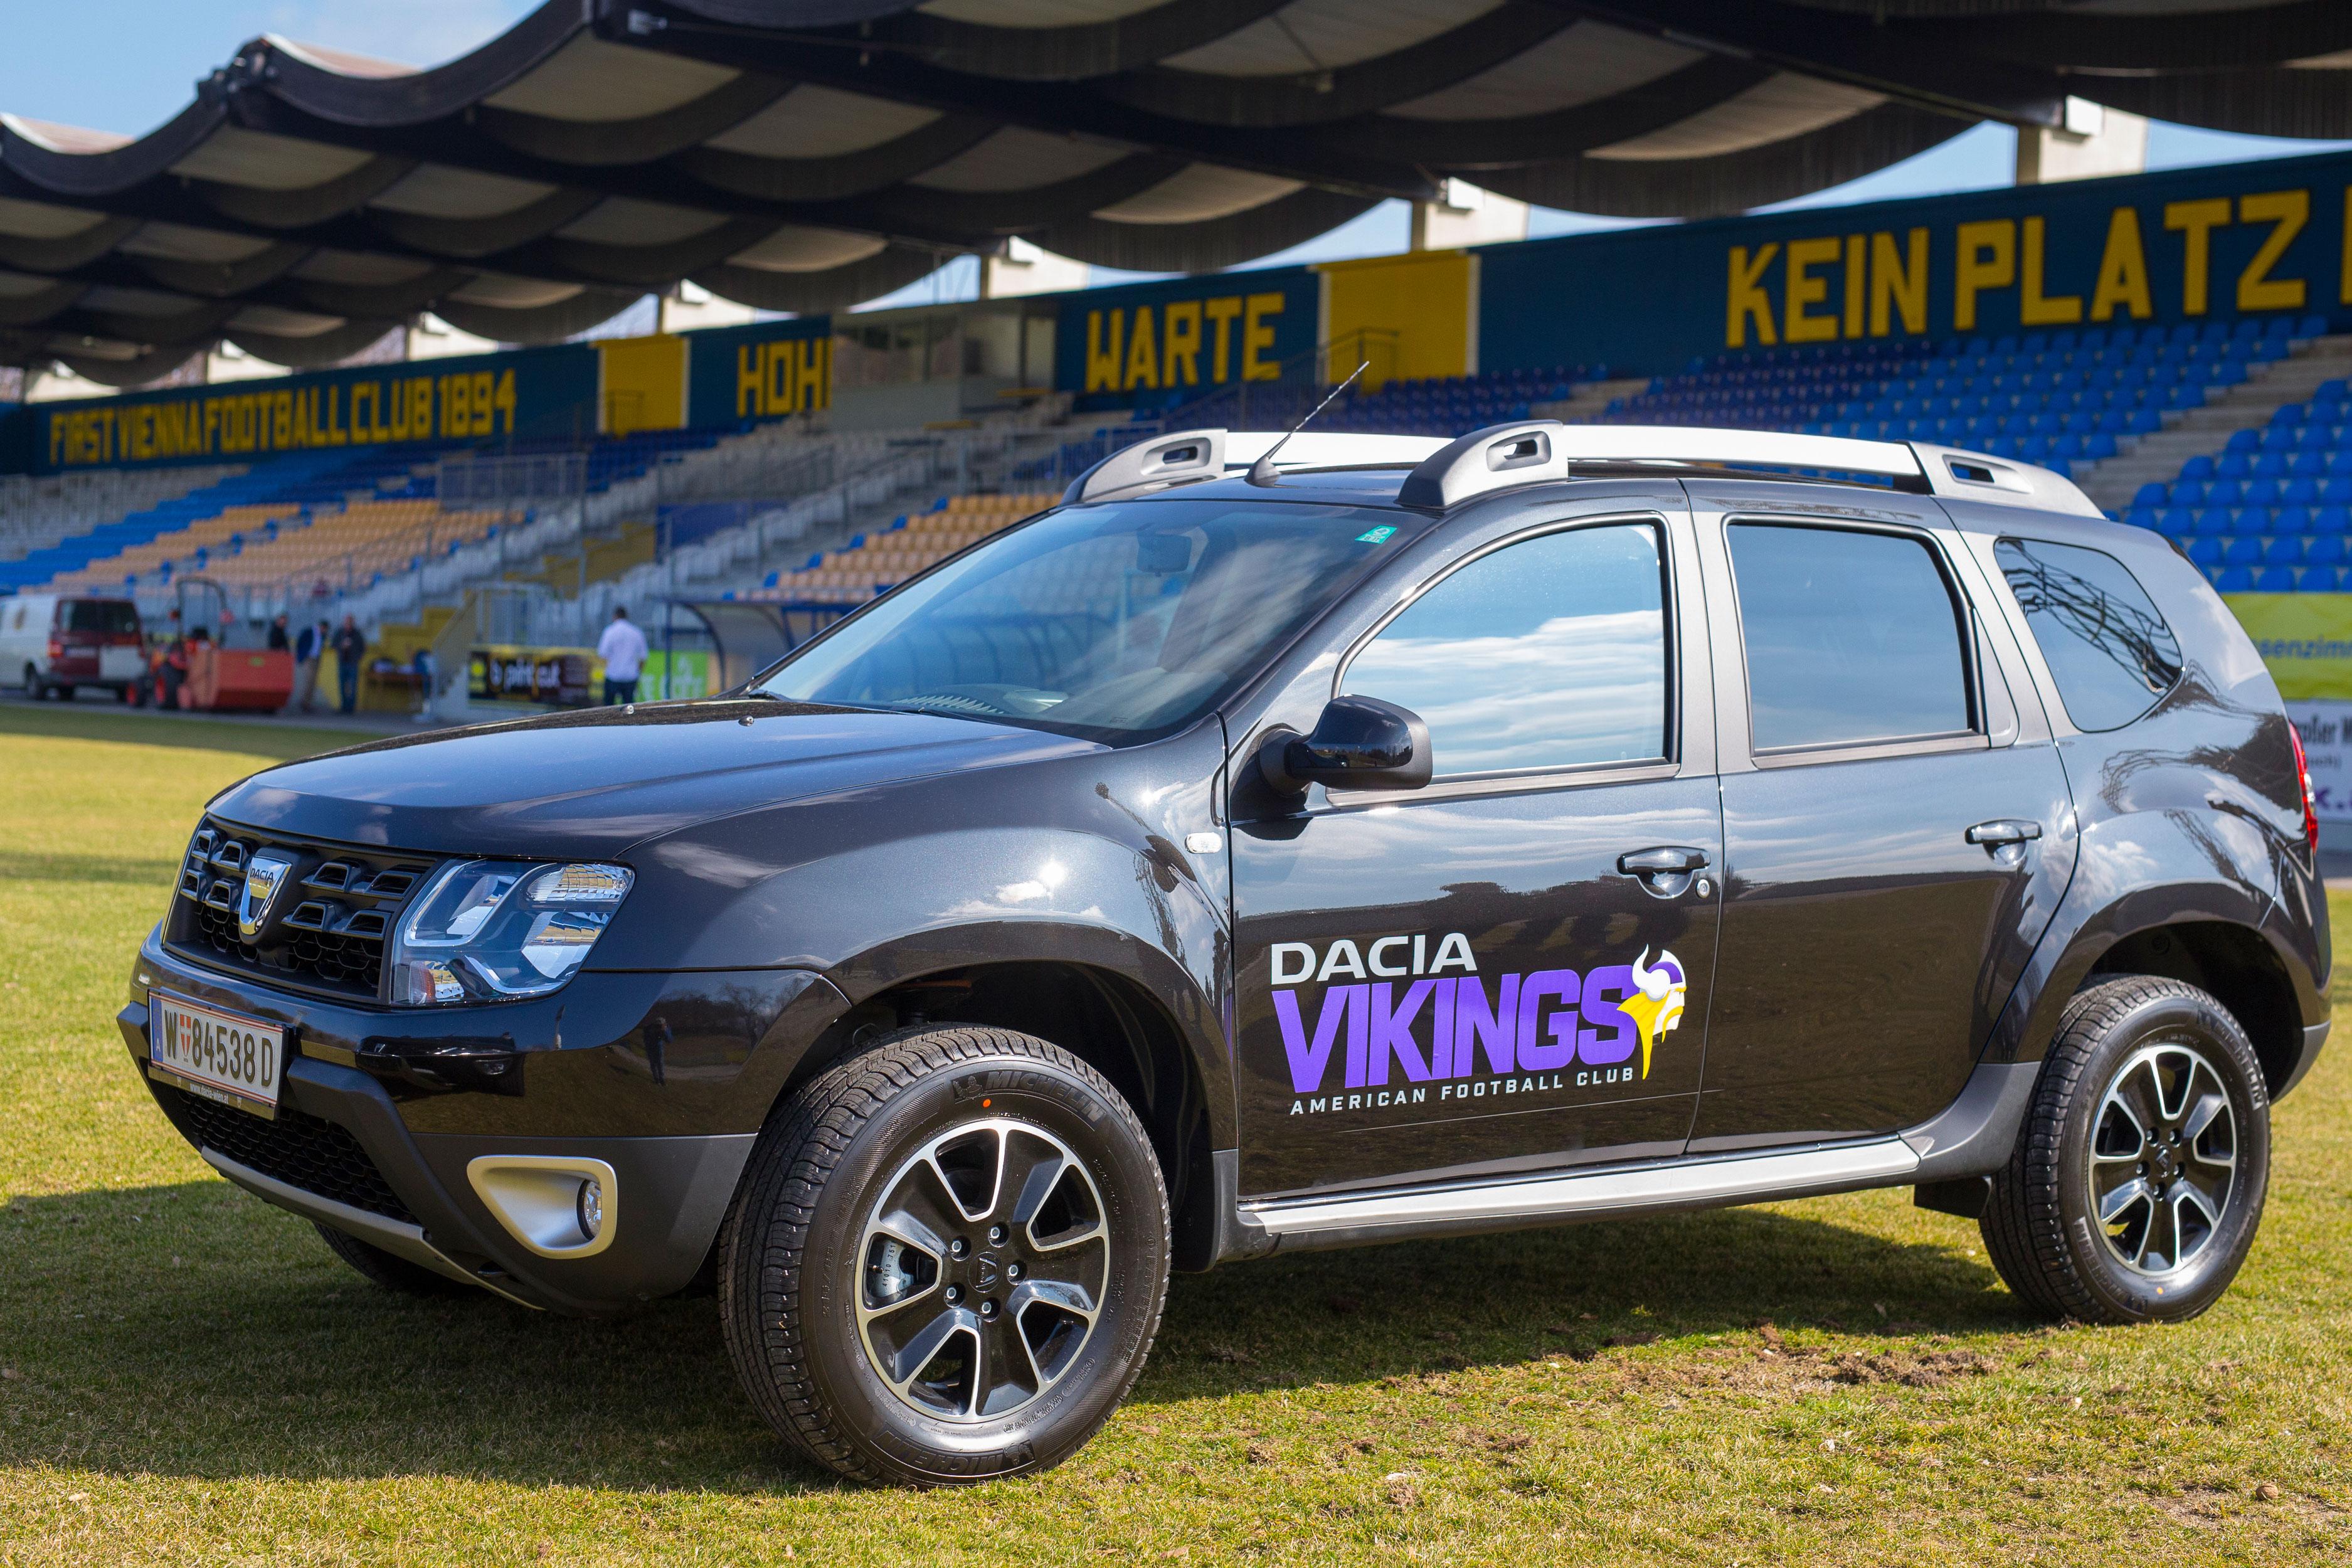 Erfolgsteam: Dacia Vikings gewinnen Austrian Bowl